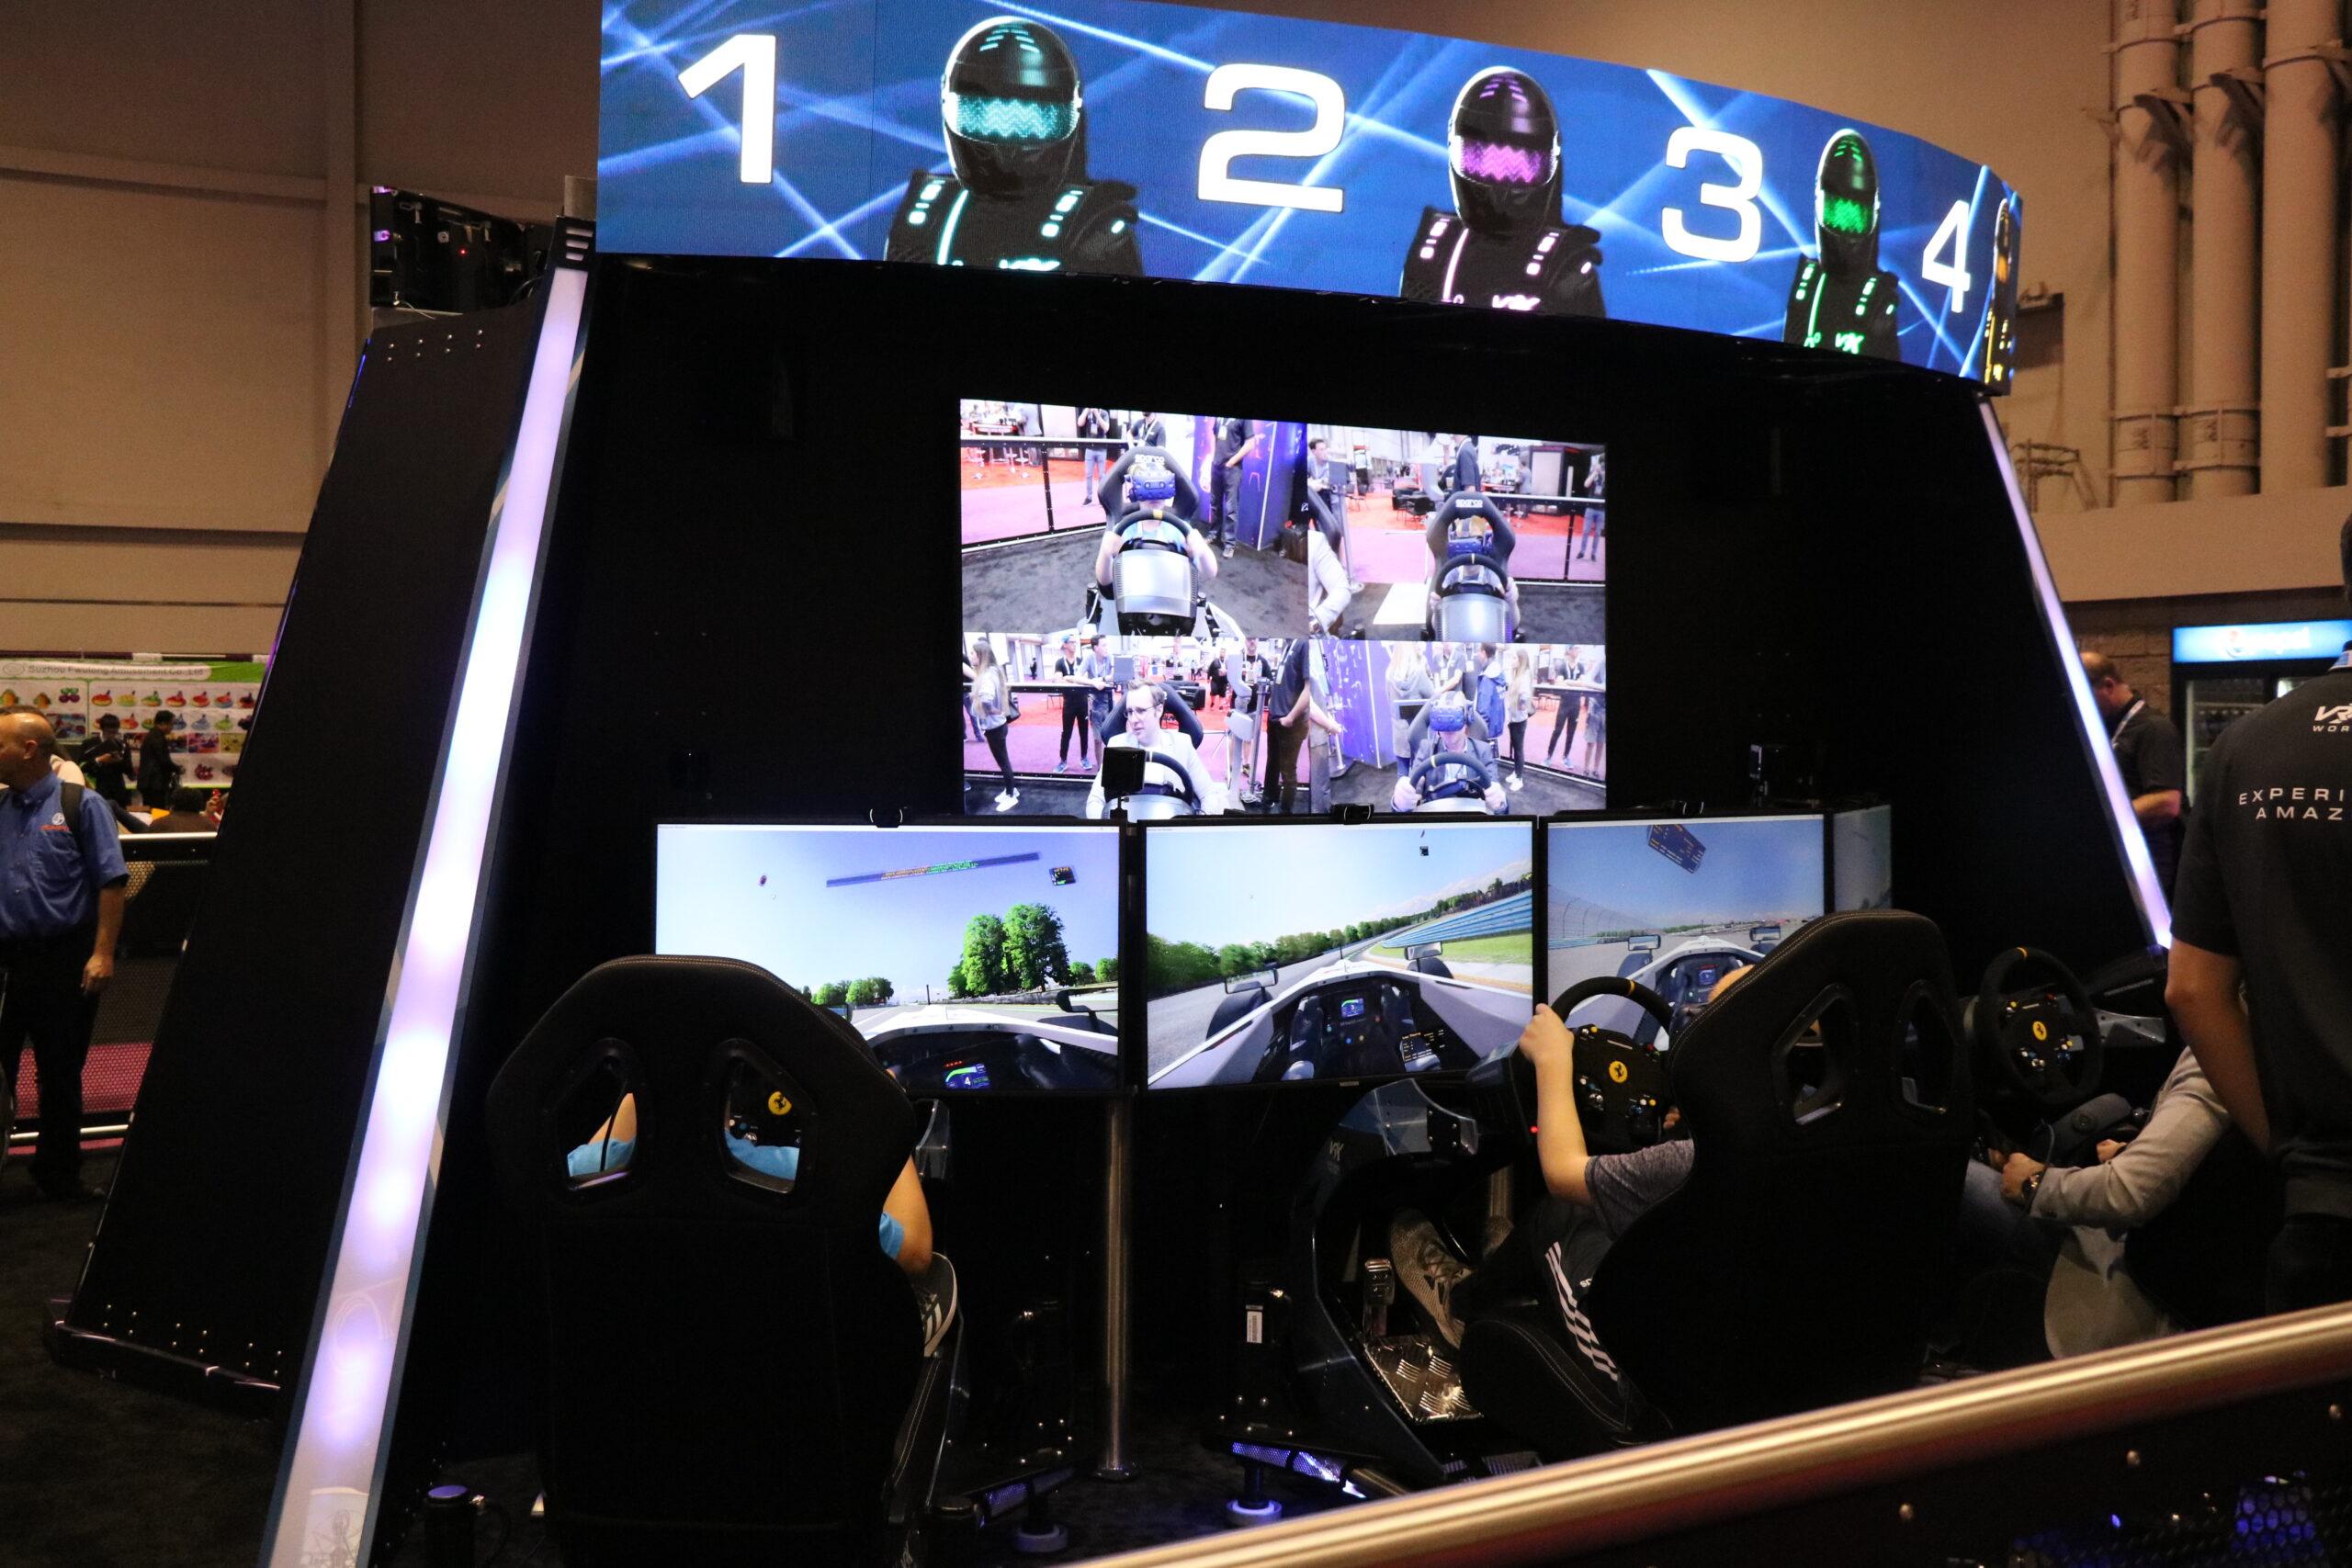 vrx raceroom commercial simulation